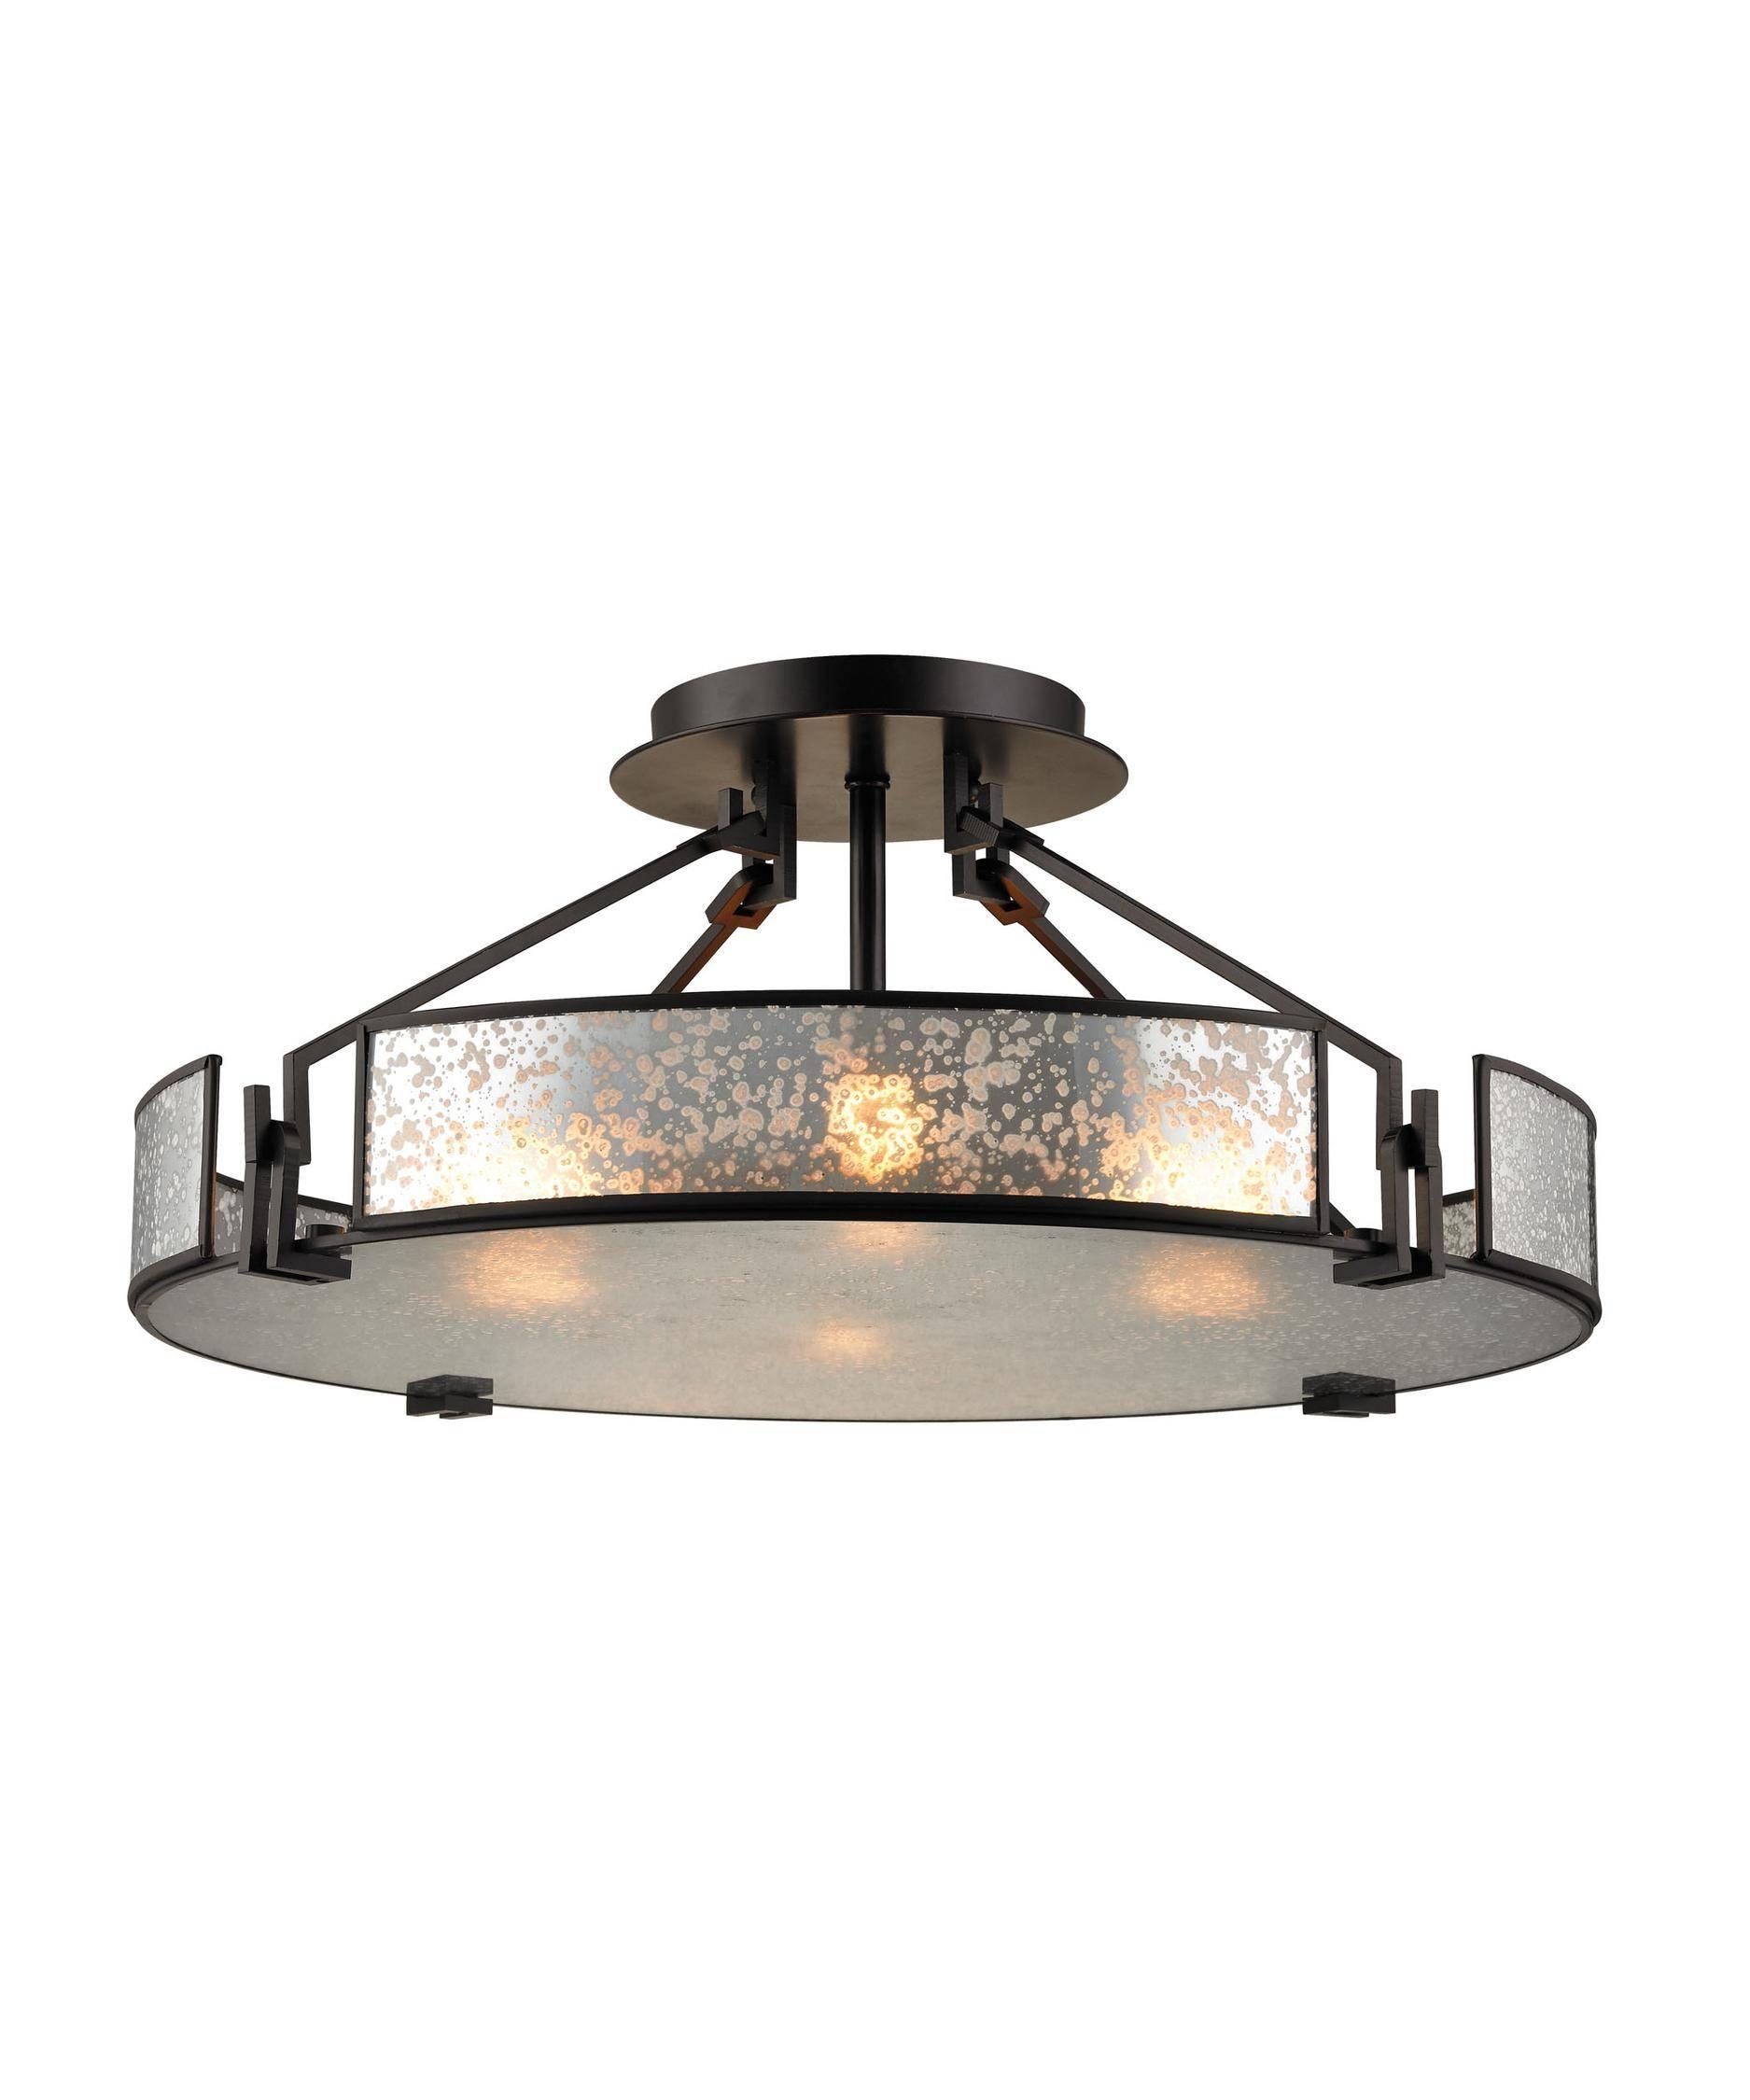 Elk Lighting 57091-4 Lindhurst 21 Inch Wide Semi Flush Mount for Mercury Glass Lights Fixtures (Image 6 of 15)